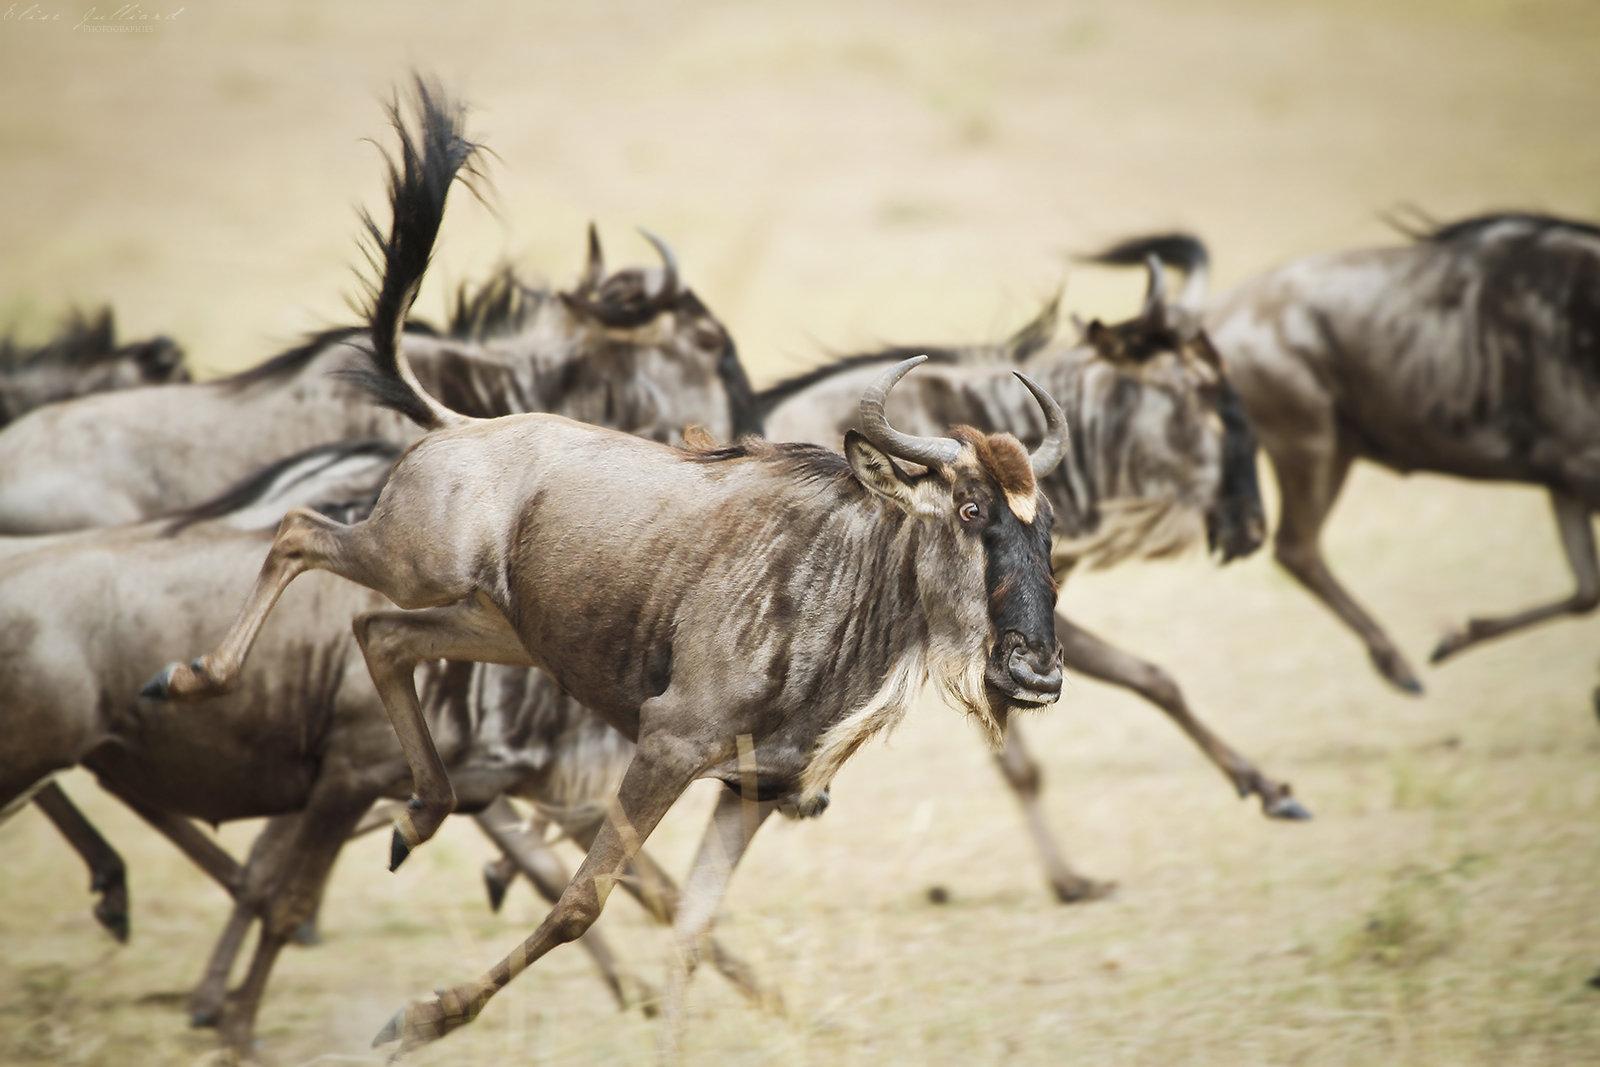 elise-julliard-photographe-tanzanie-grande-migration-gnous-serengeti-national-park-afrique